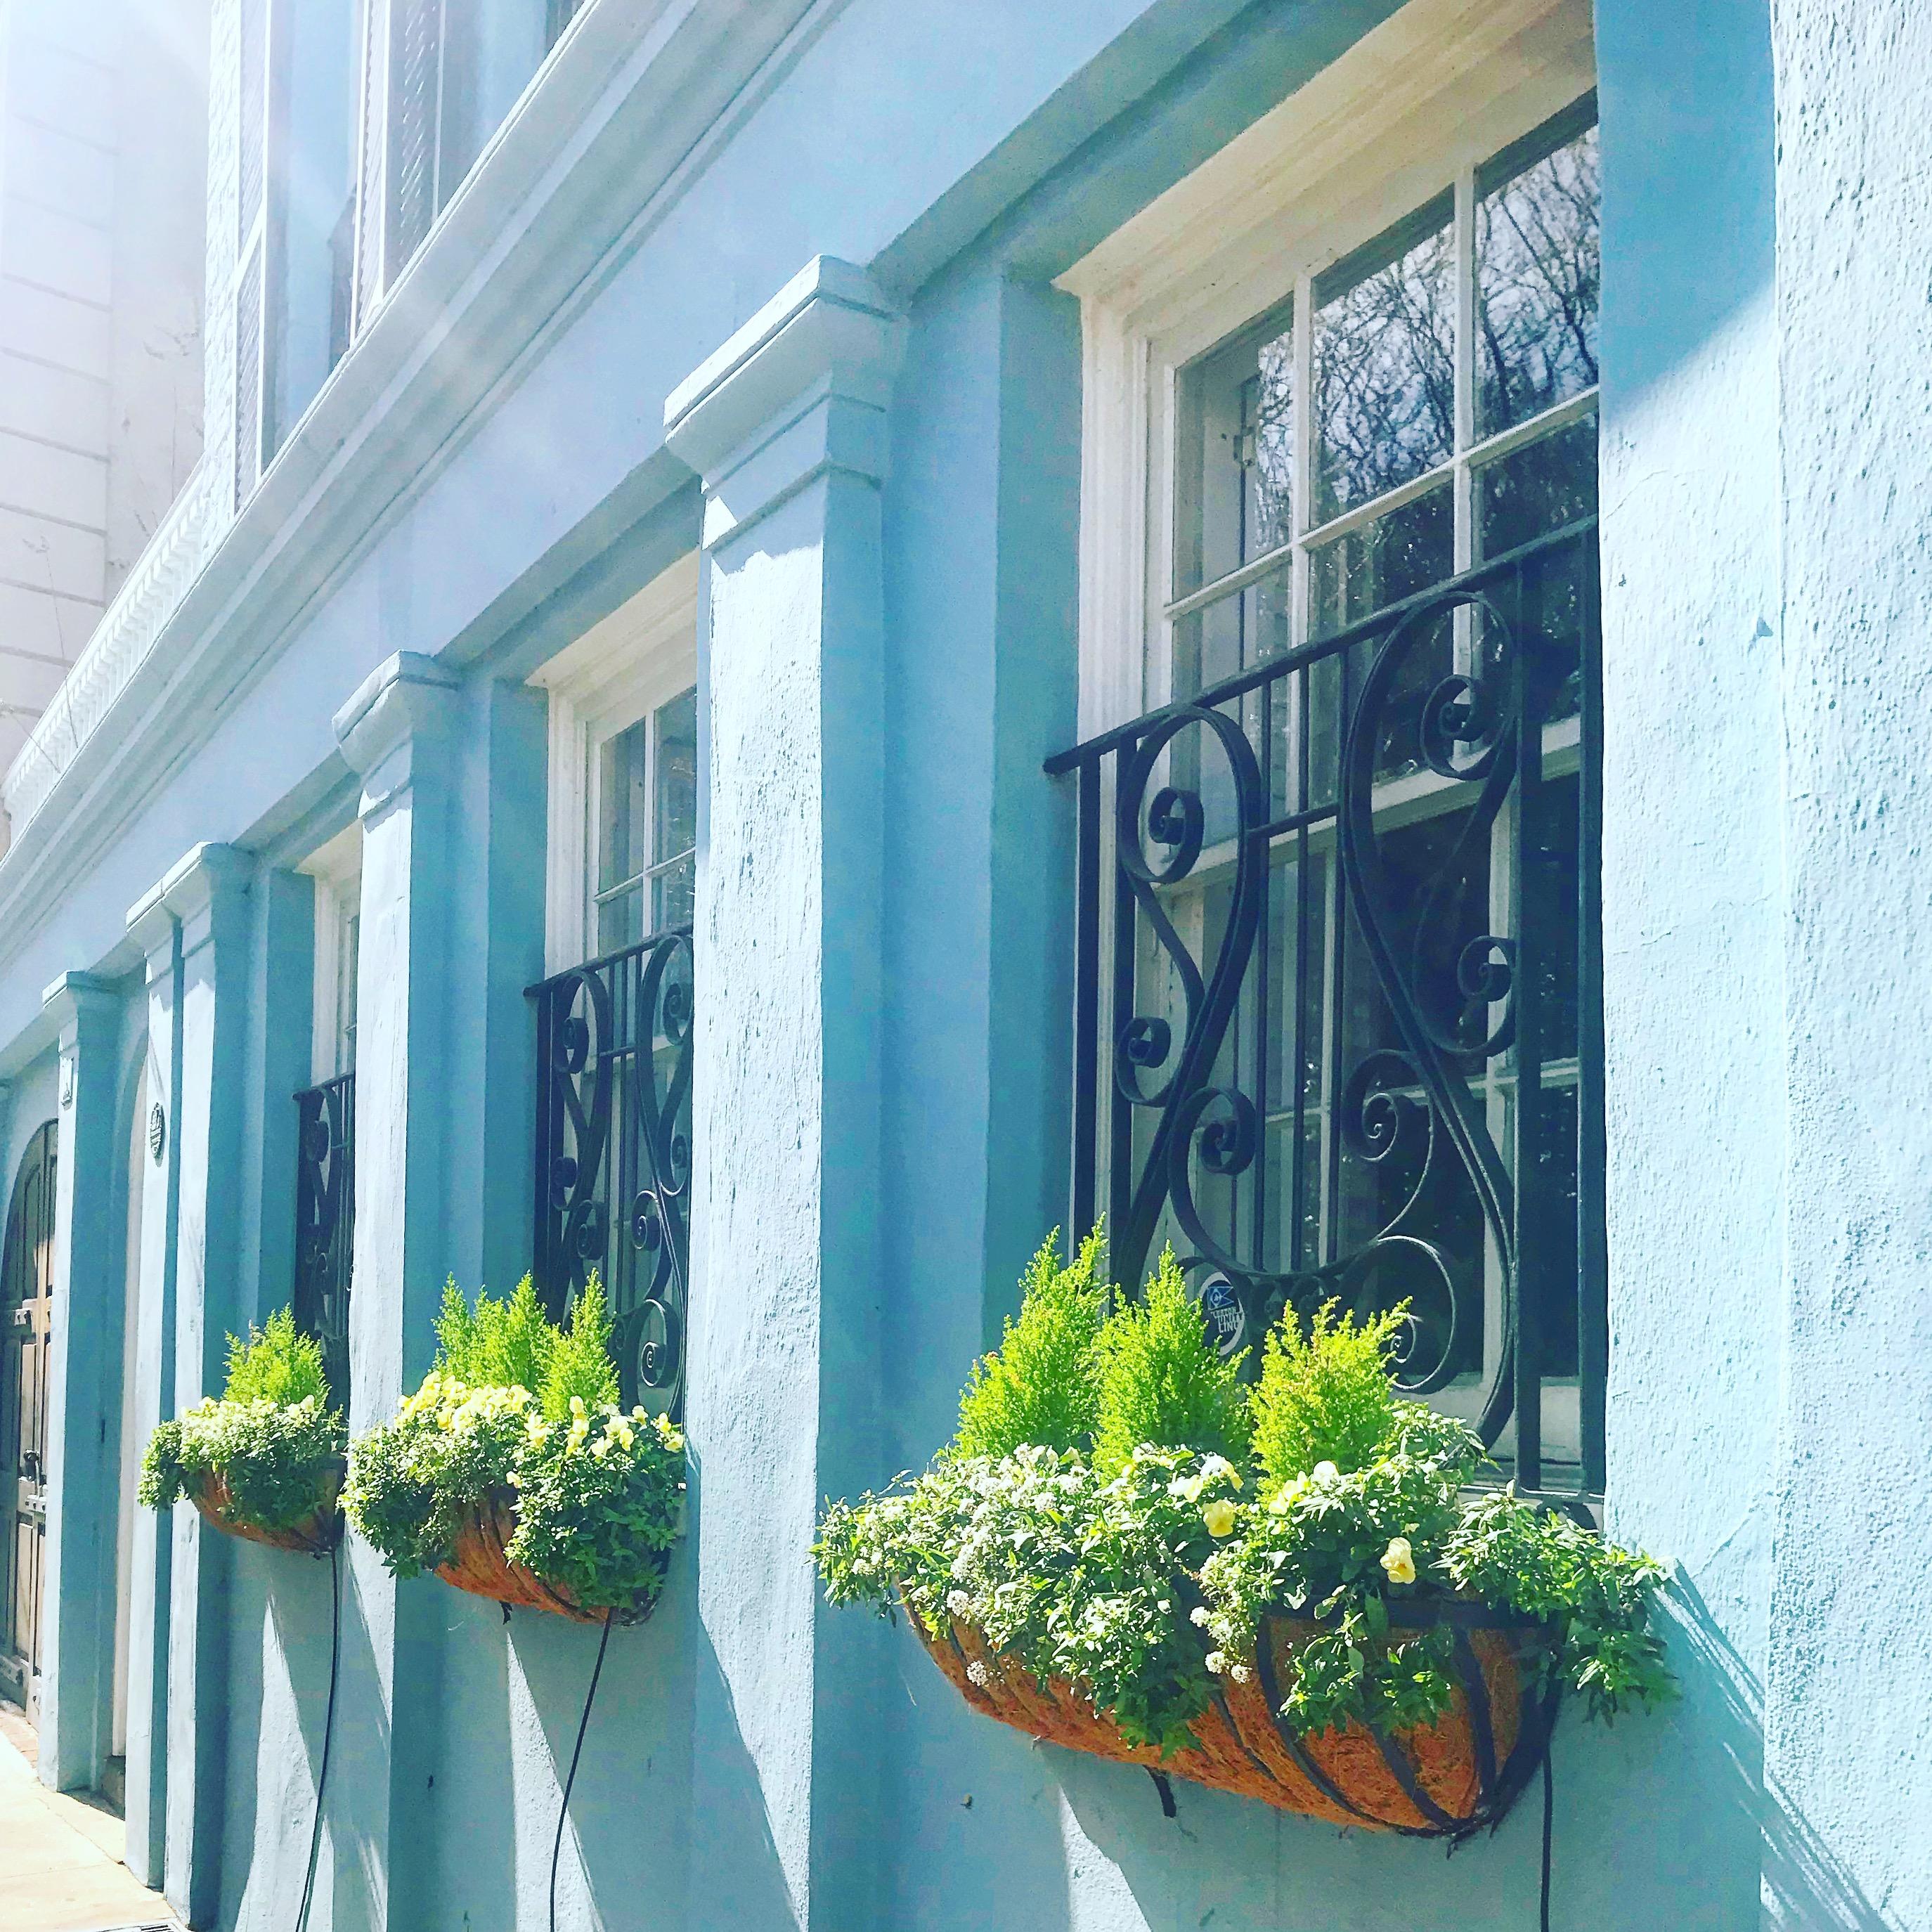 Wanderlusting: Through Charleston